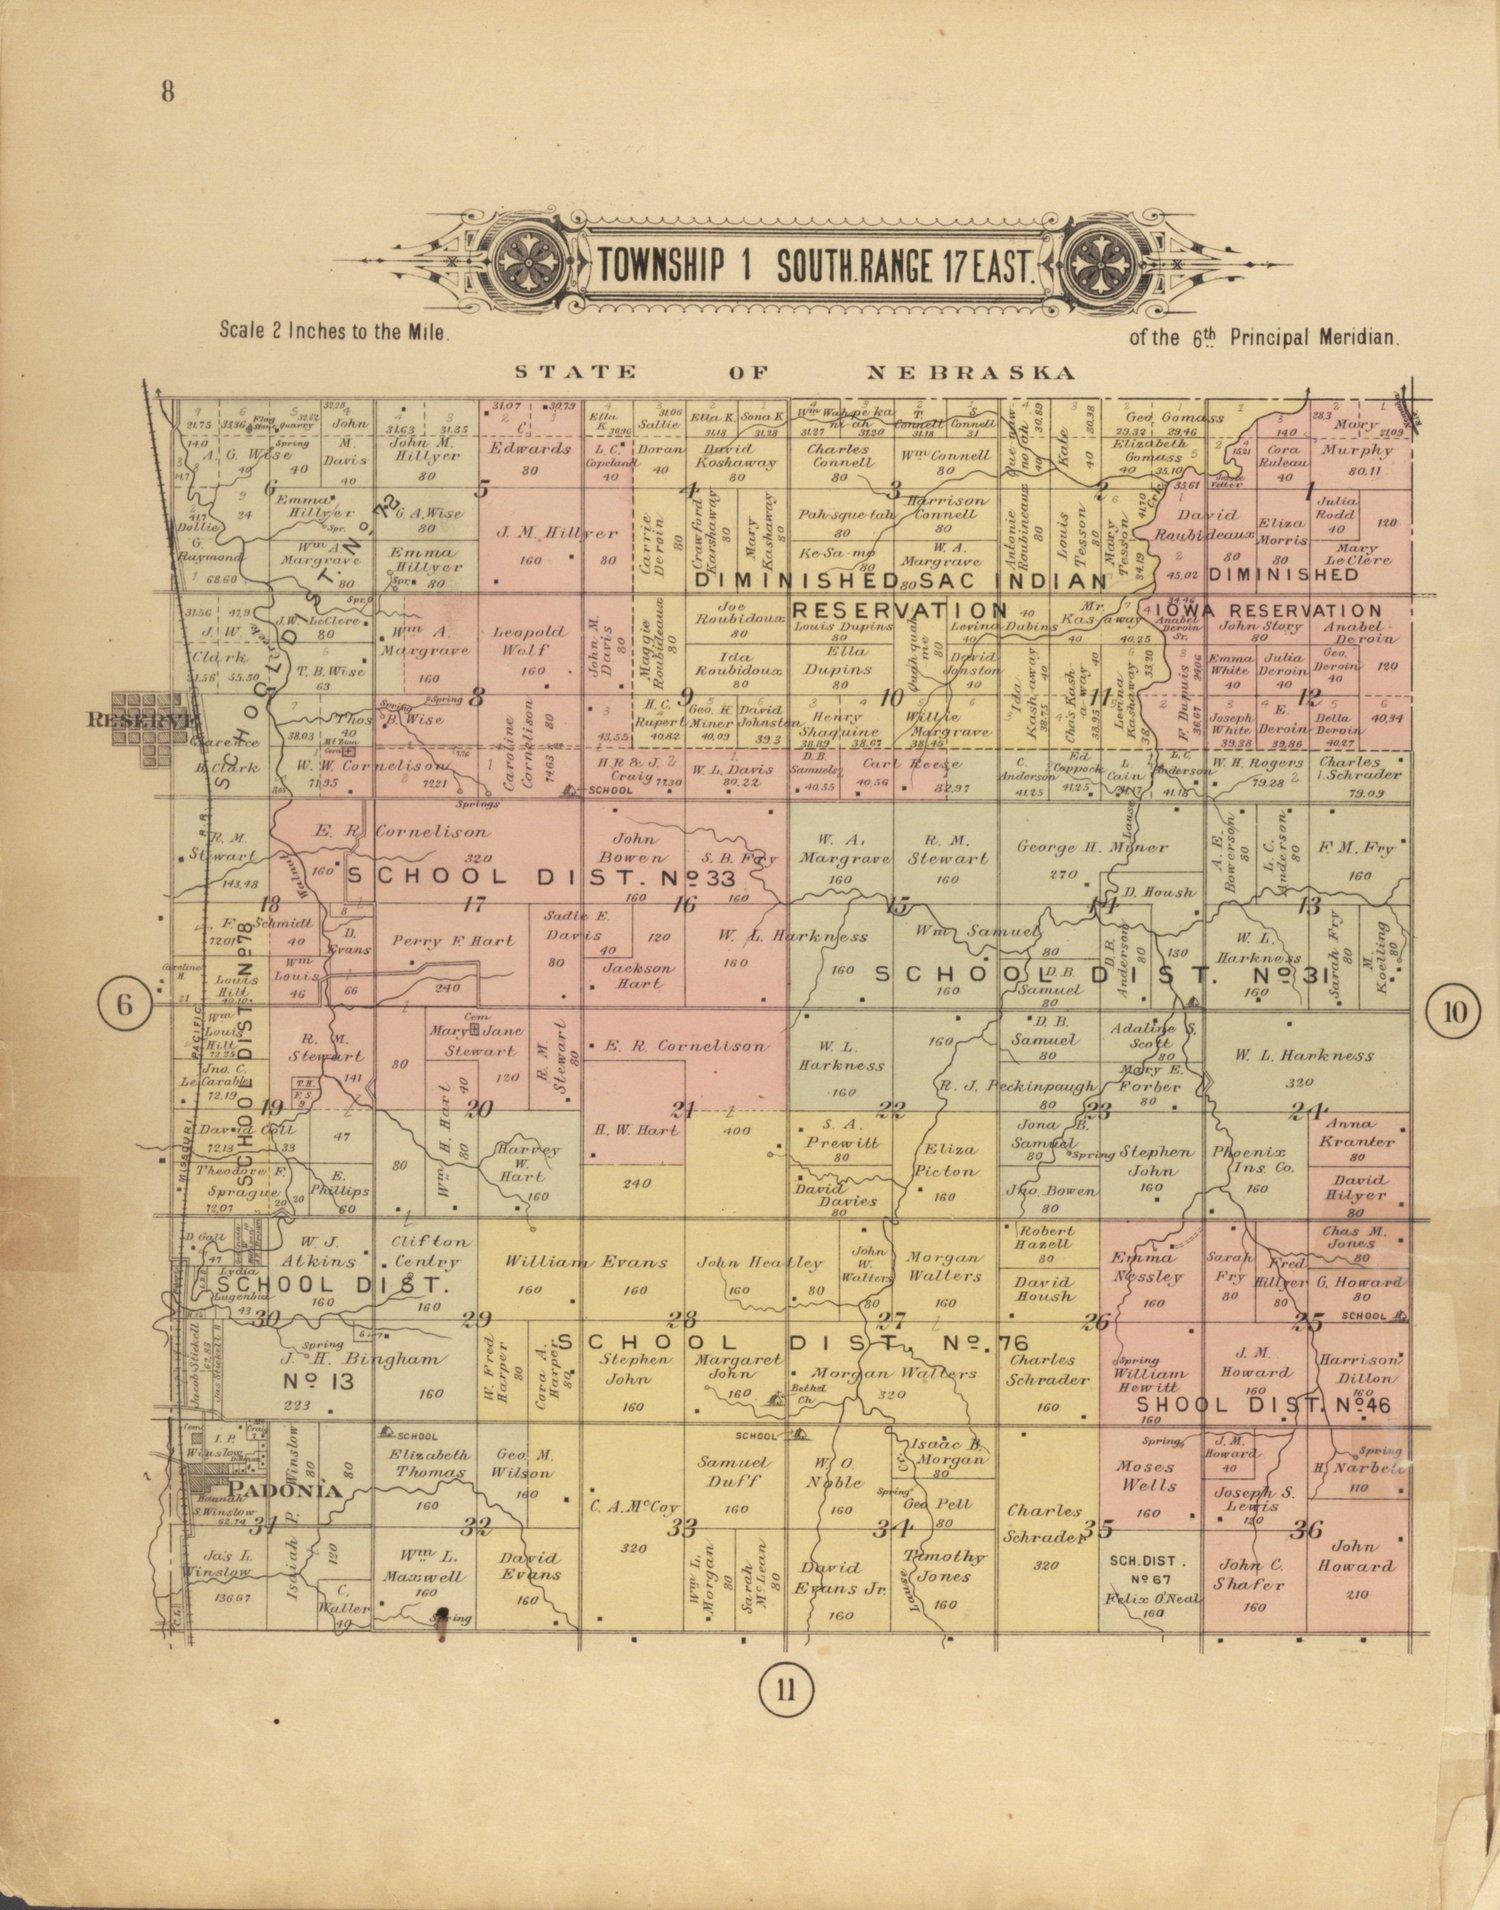 Plat book of Brown County, Kansas - 8